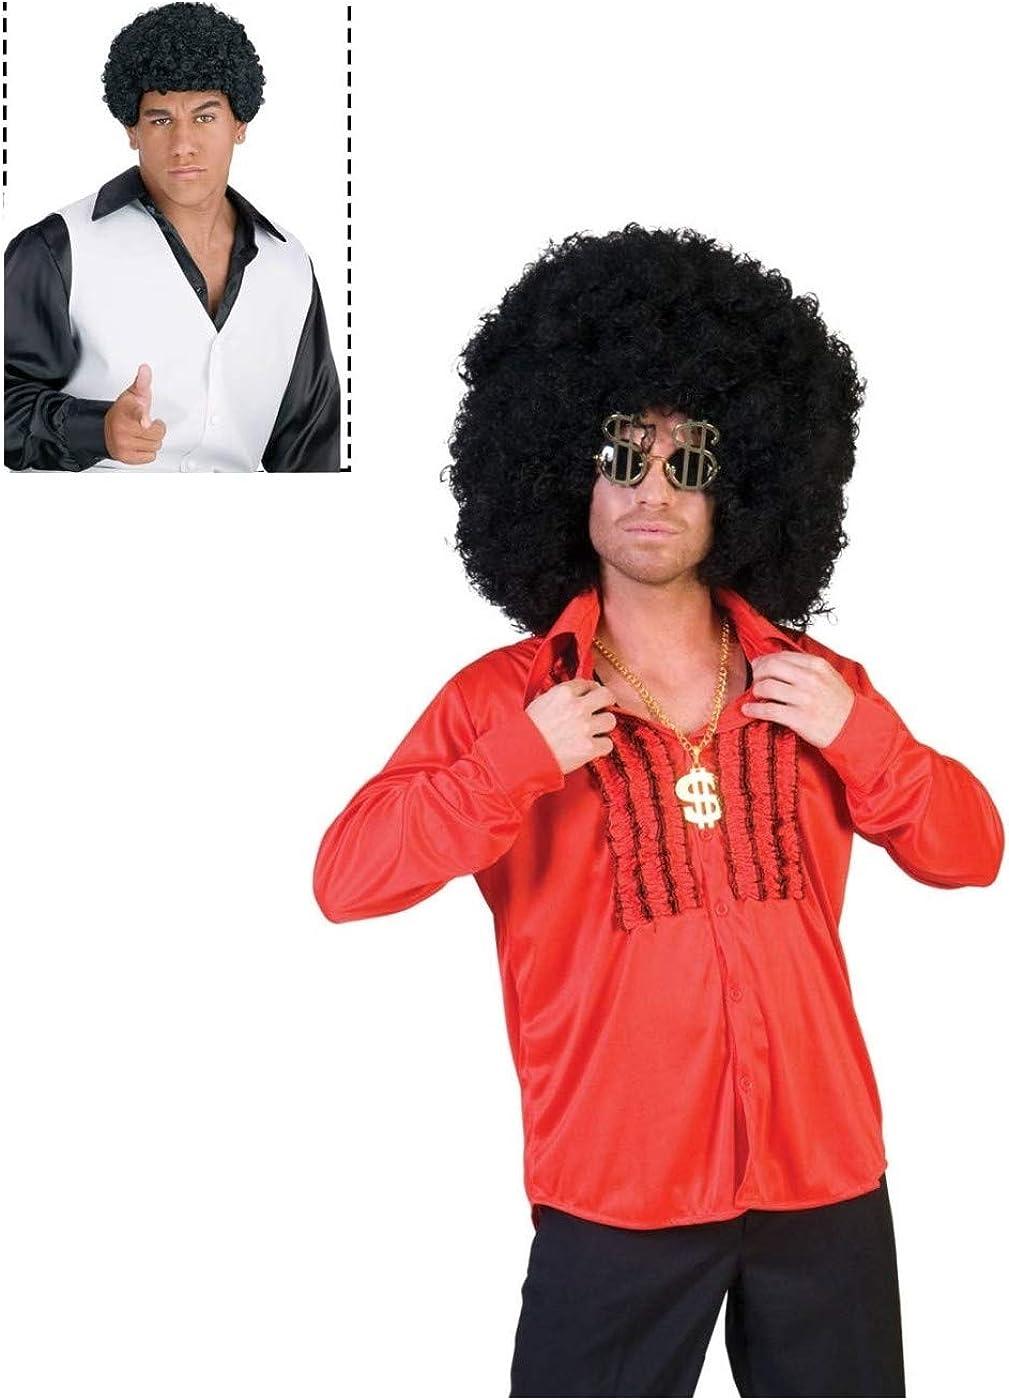 Cheap bargain Funny Fashion Disco Sale item Costume Kit